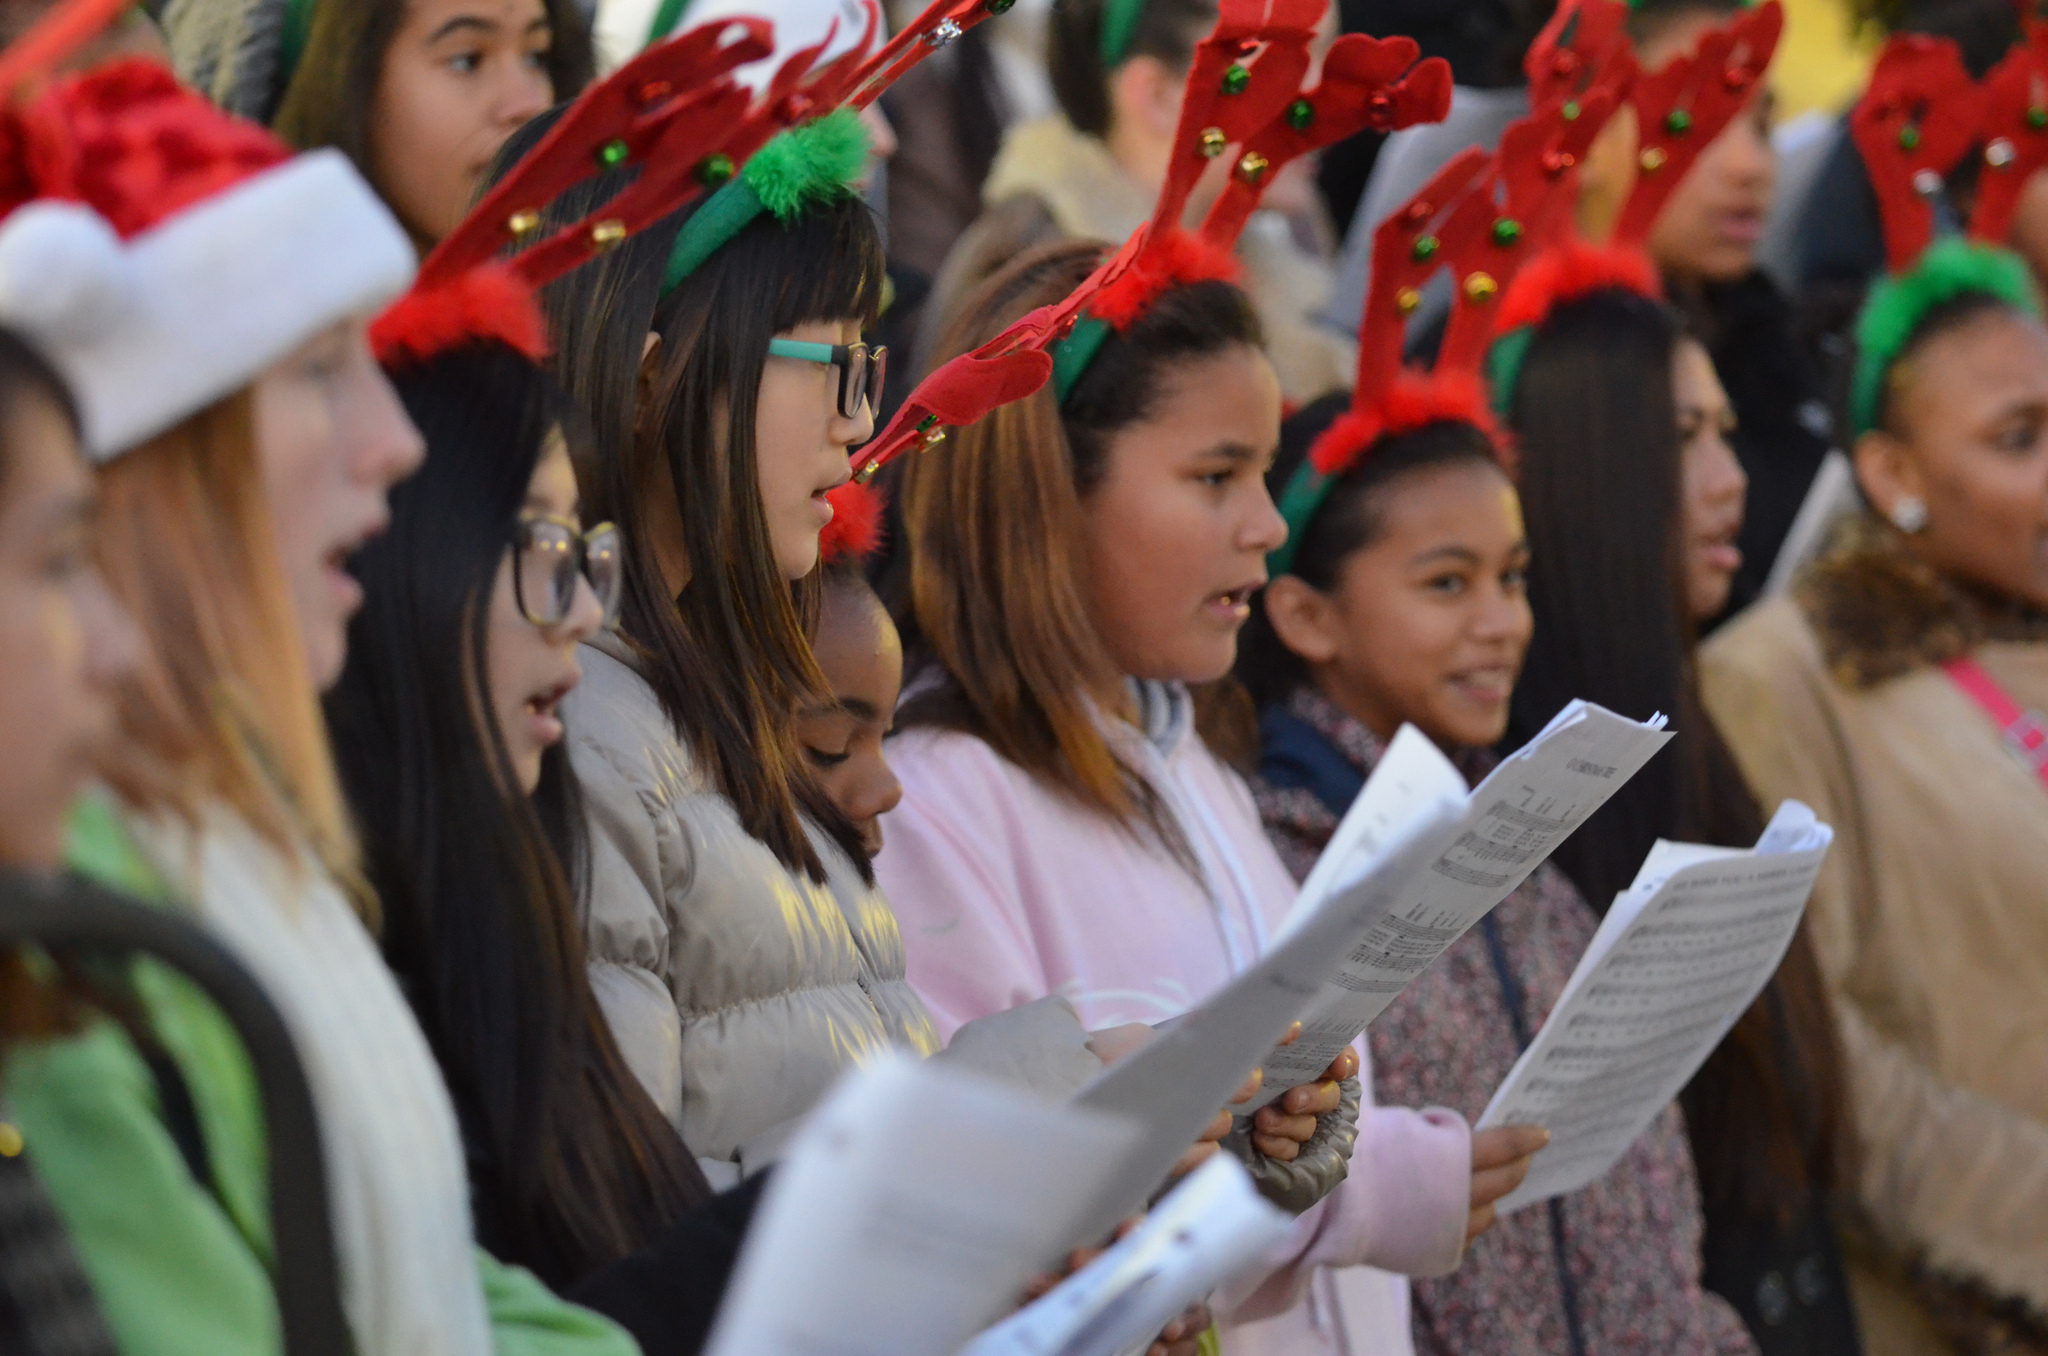 Belt out classic Christmas carols